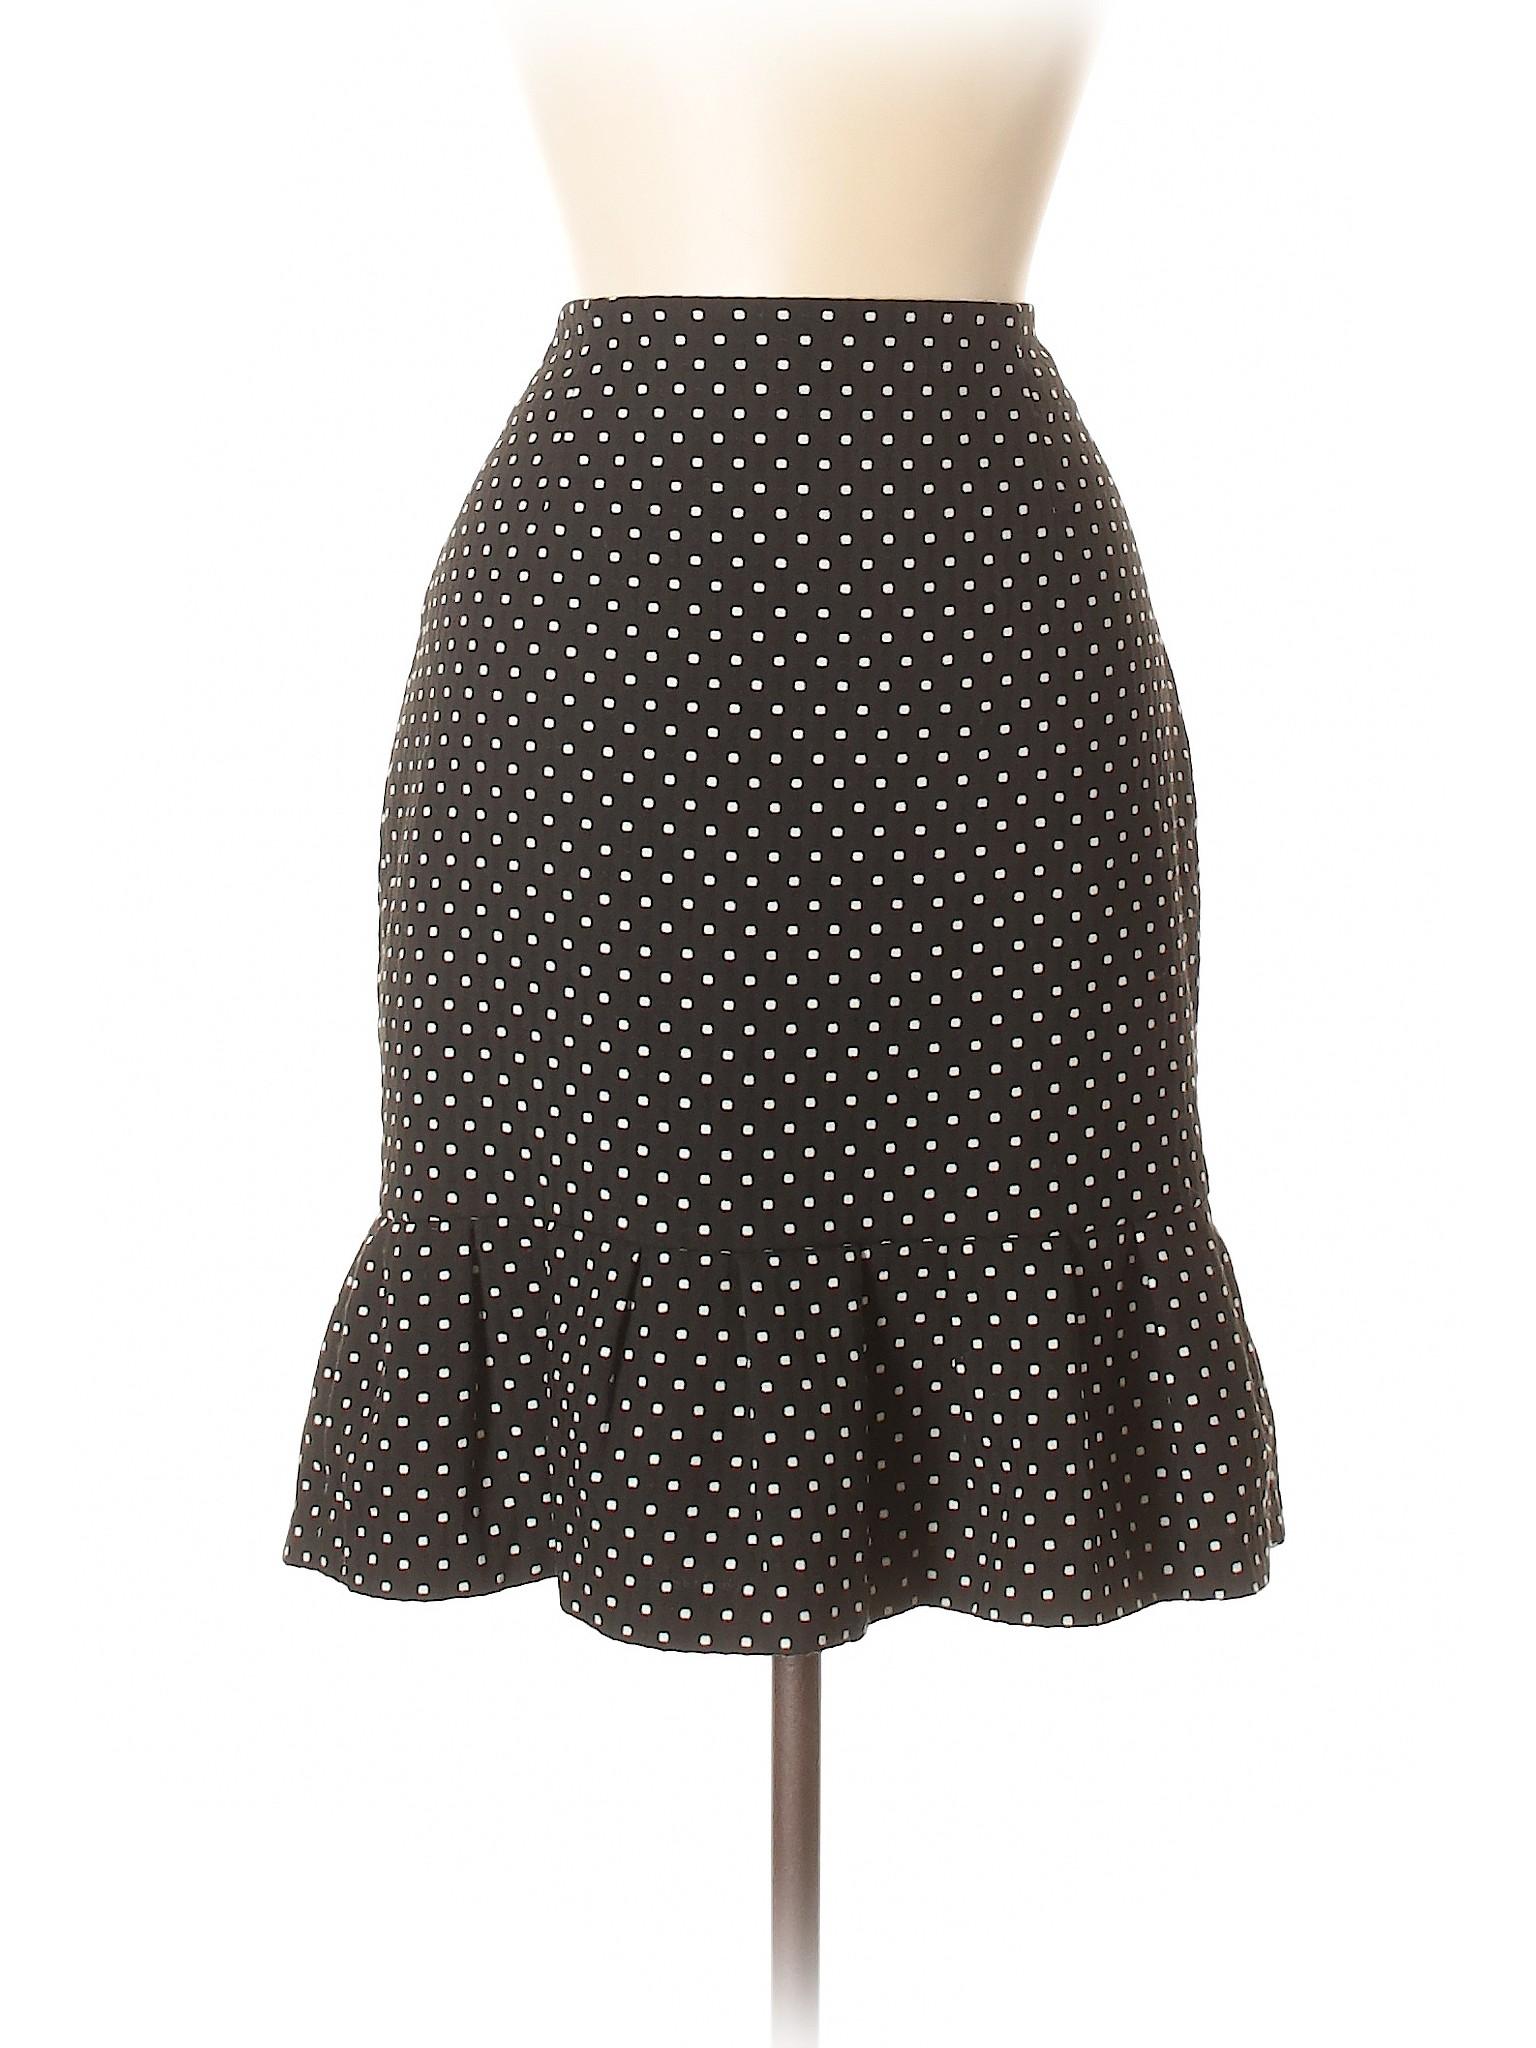 Boutique Boutique Casual Boutique Skirt Casual Skirt Casual Boutique Skirt Casual B0I5xq